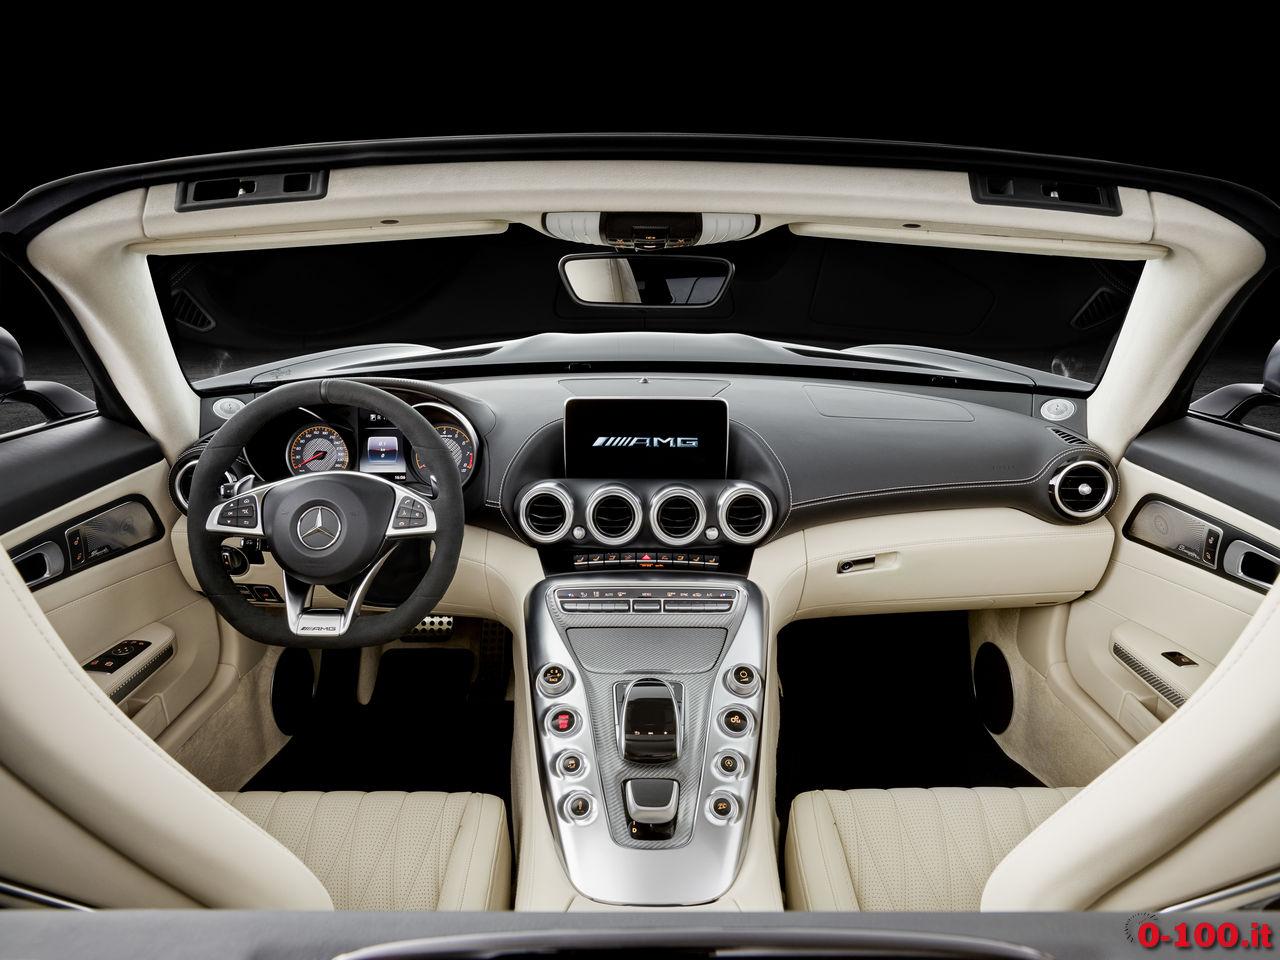 mercedes-amg-gt-C-roadster-2017-prezzo-price_0-100-20